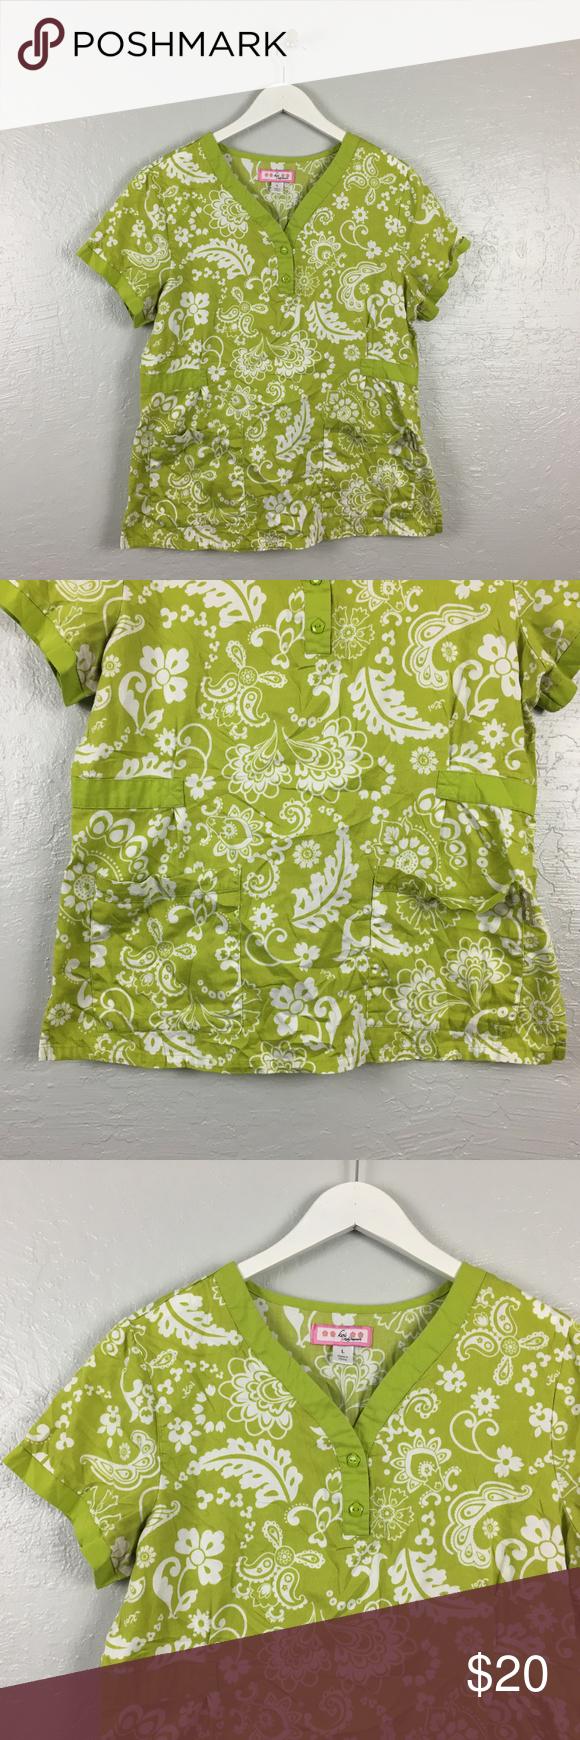 Mike S Koi Sleeve Chest Panel Unfinished Big Jpg 2400 3200: Koi Size L Kourtney Green White Printed Scrub Top Koi